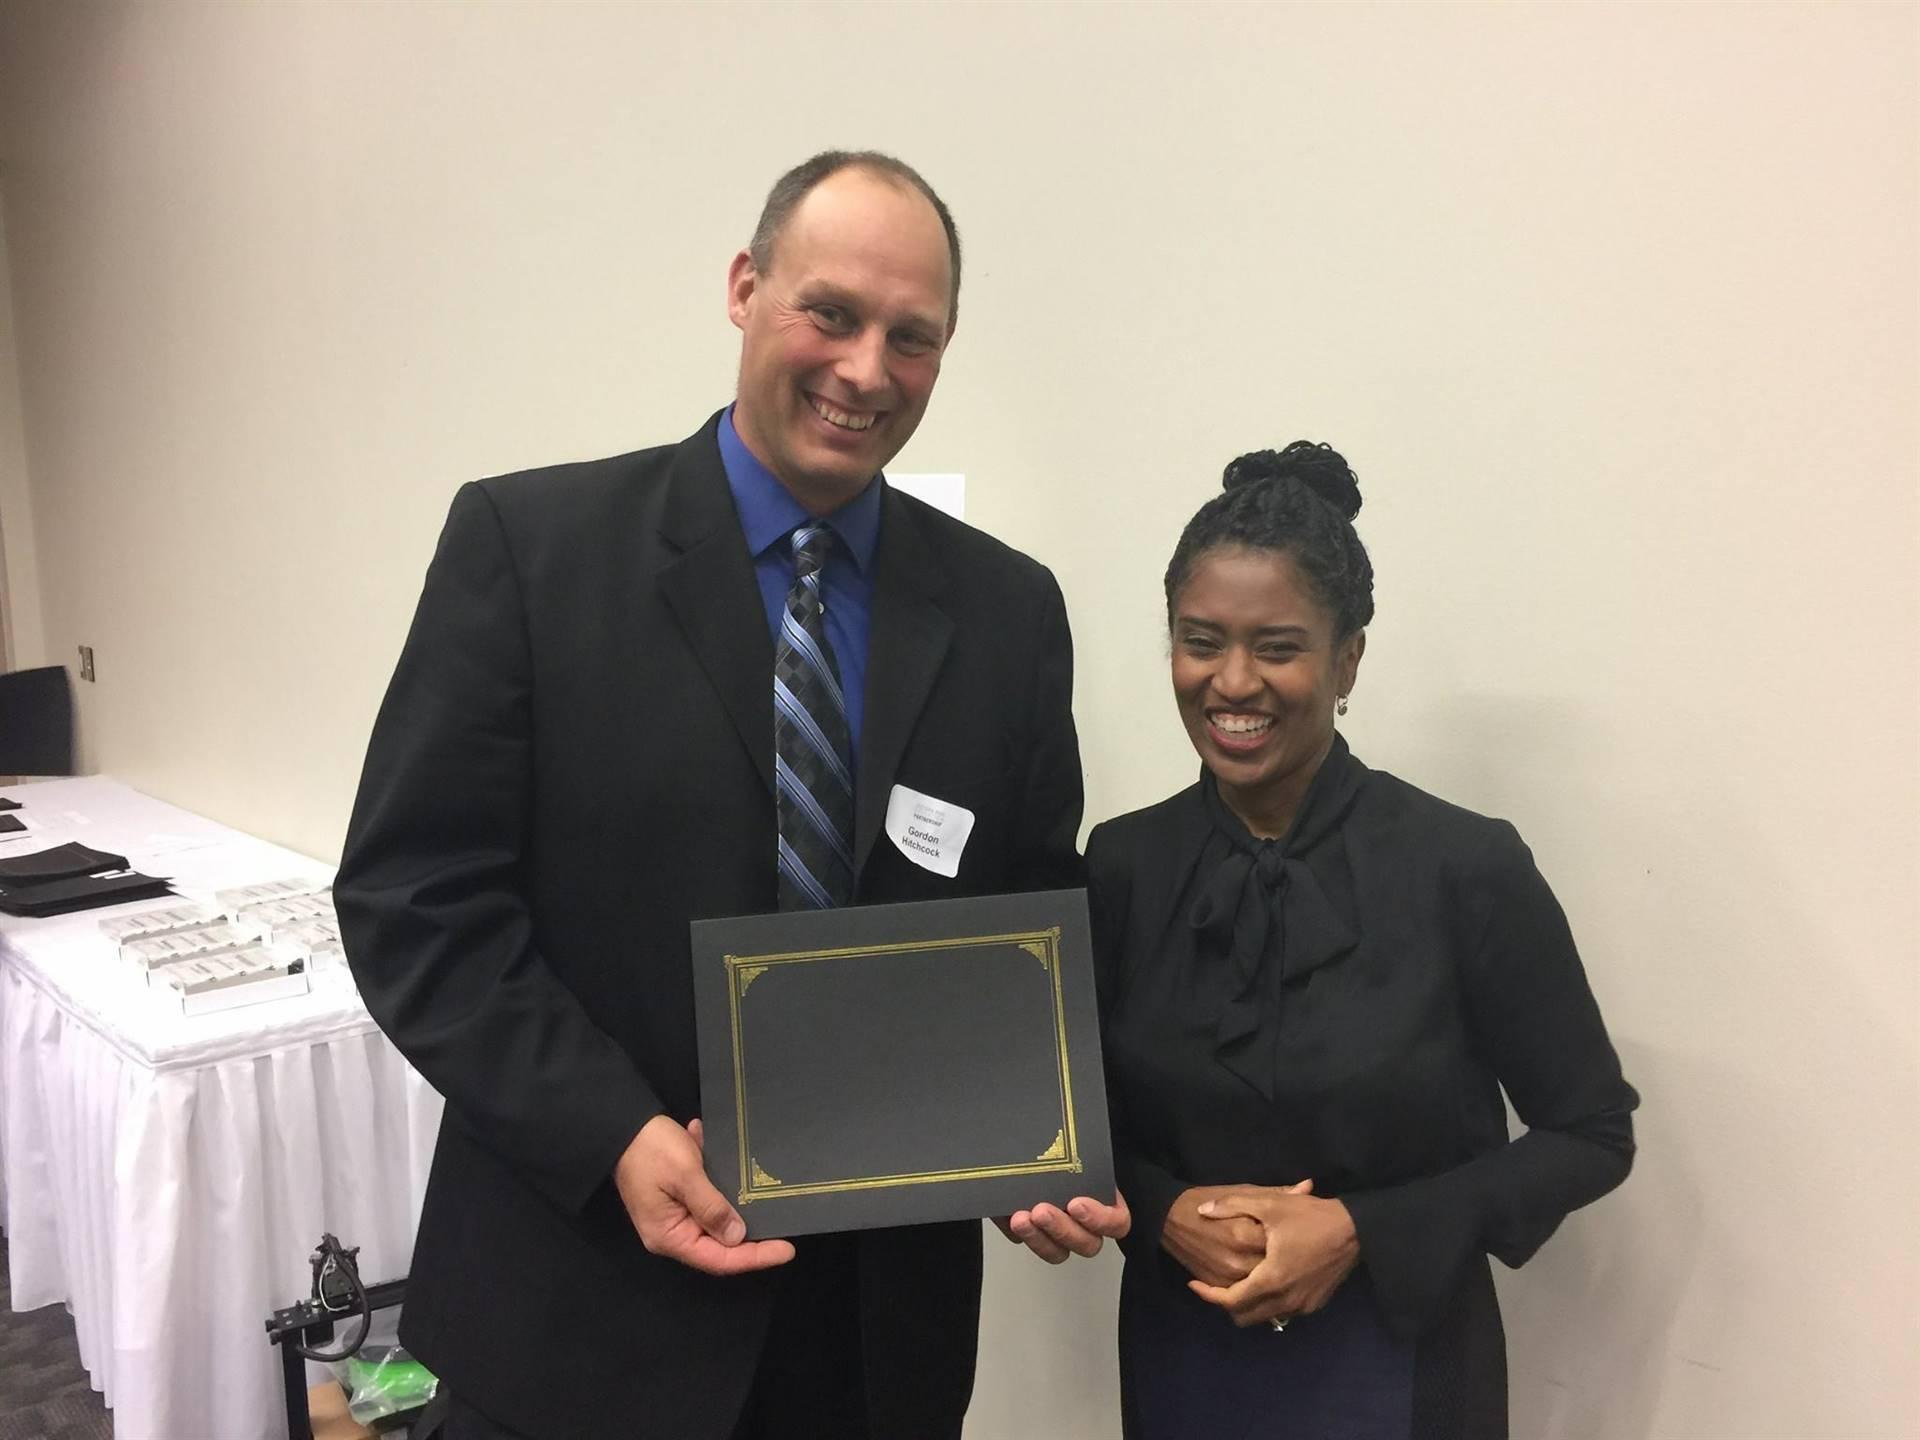 Eastern Ohio Education Partnership Certificate of Achievement